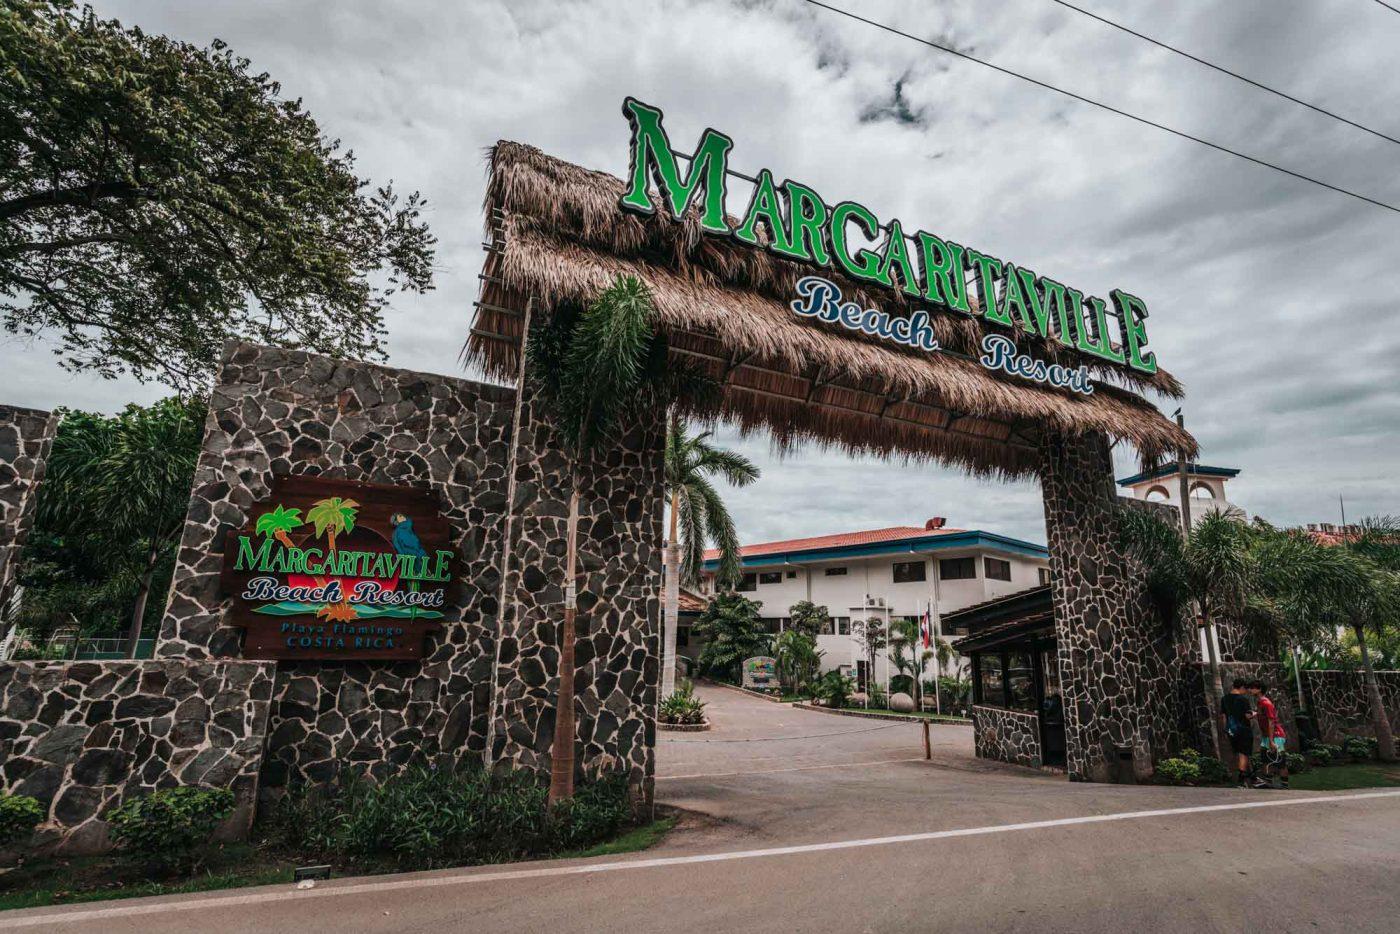 Margaritaville resort in Playa Flamingo, Costa Rica